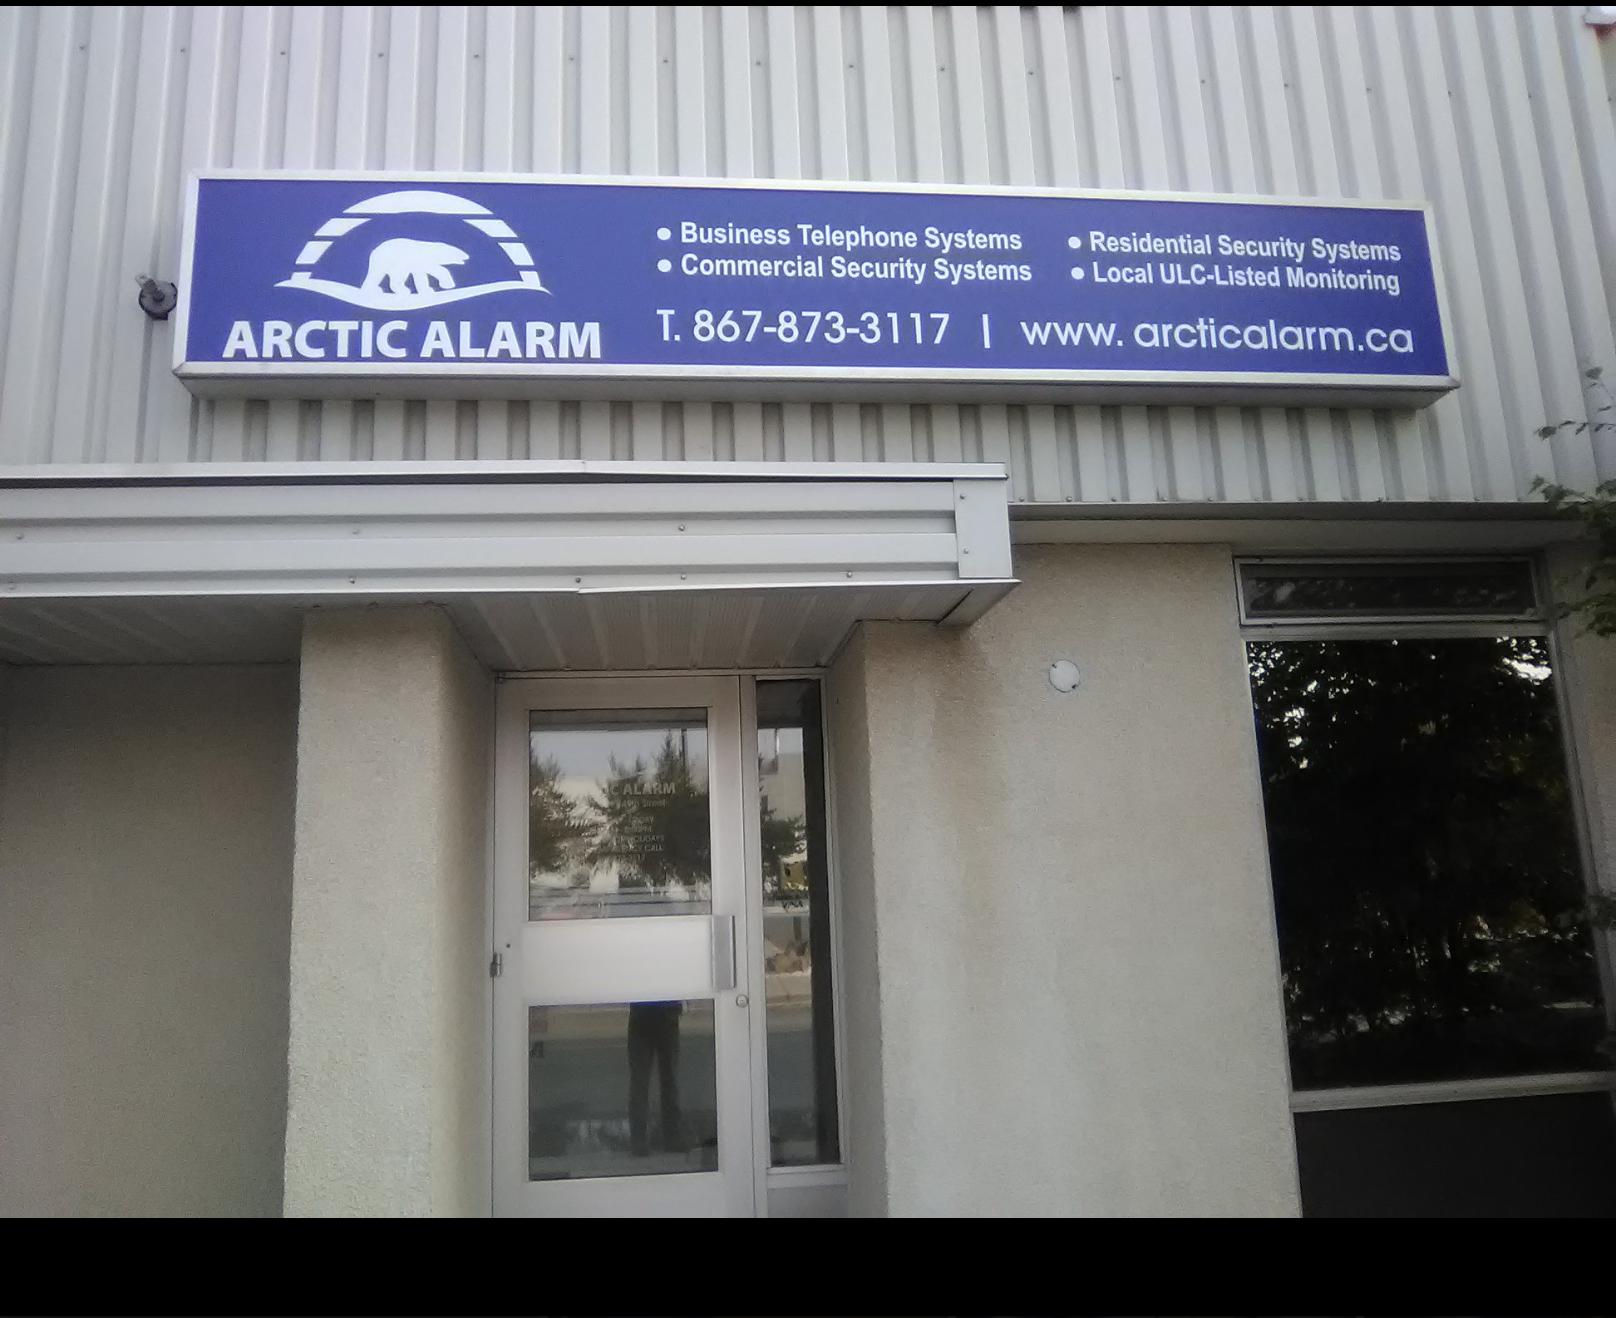 Arctic Alarm Exterior Backlit Signage